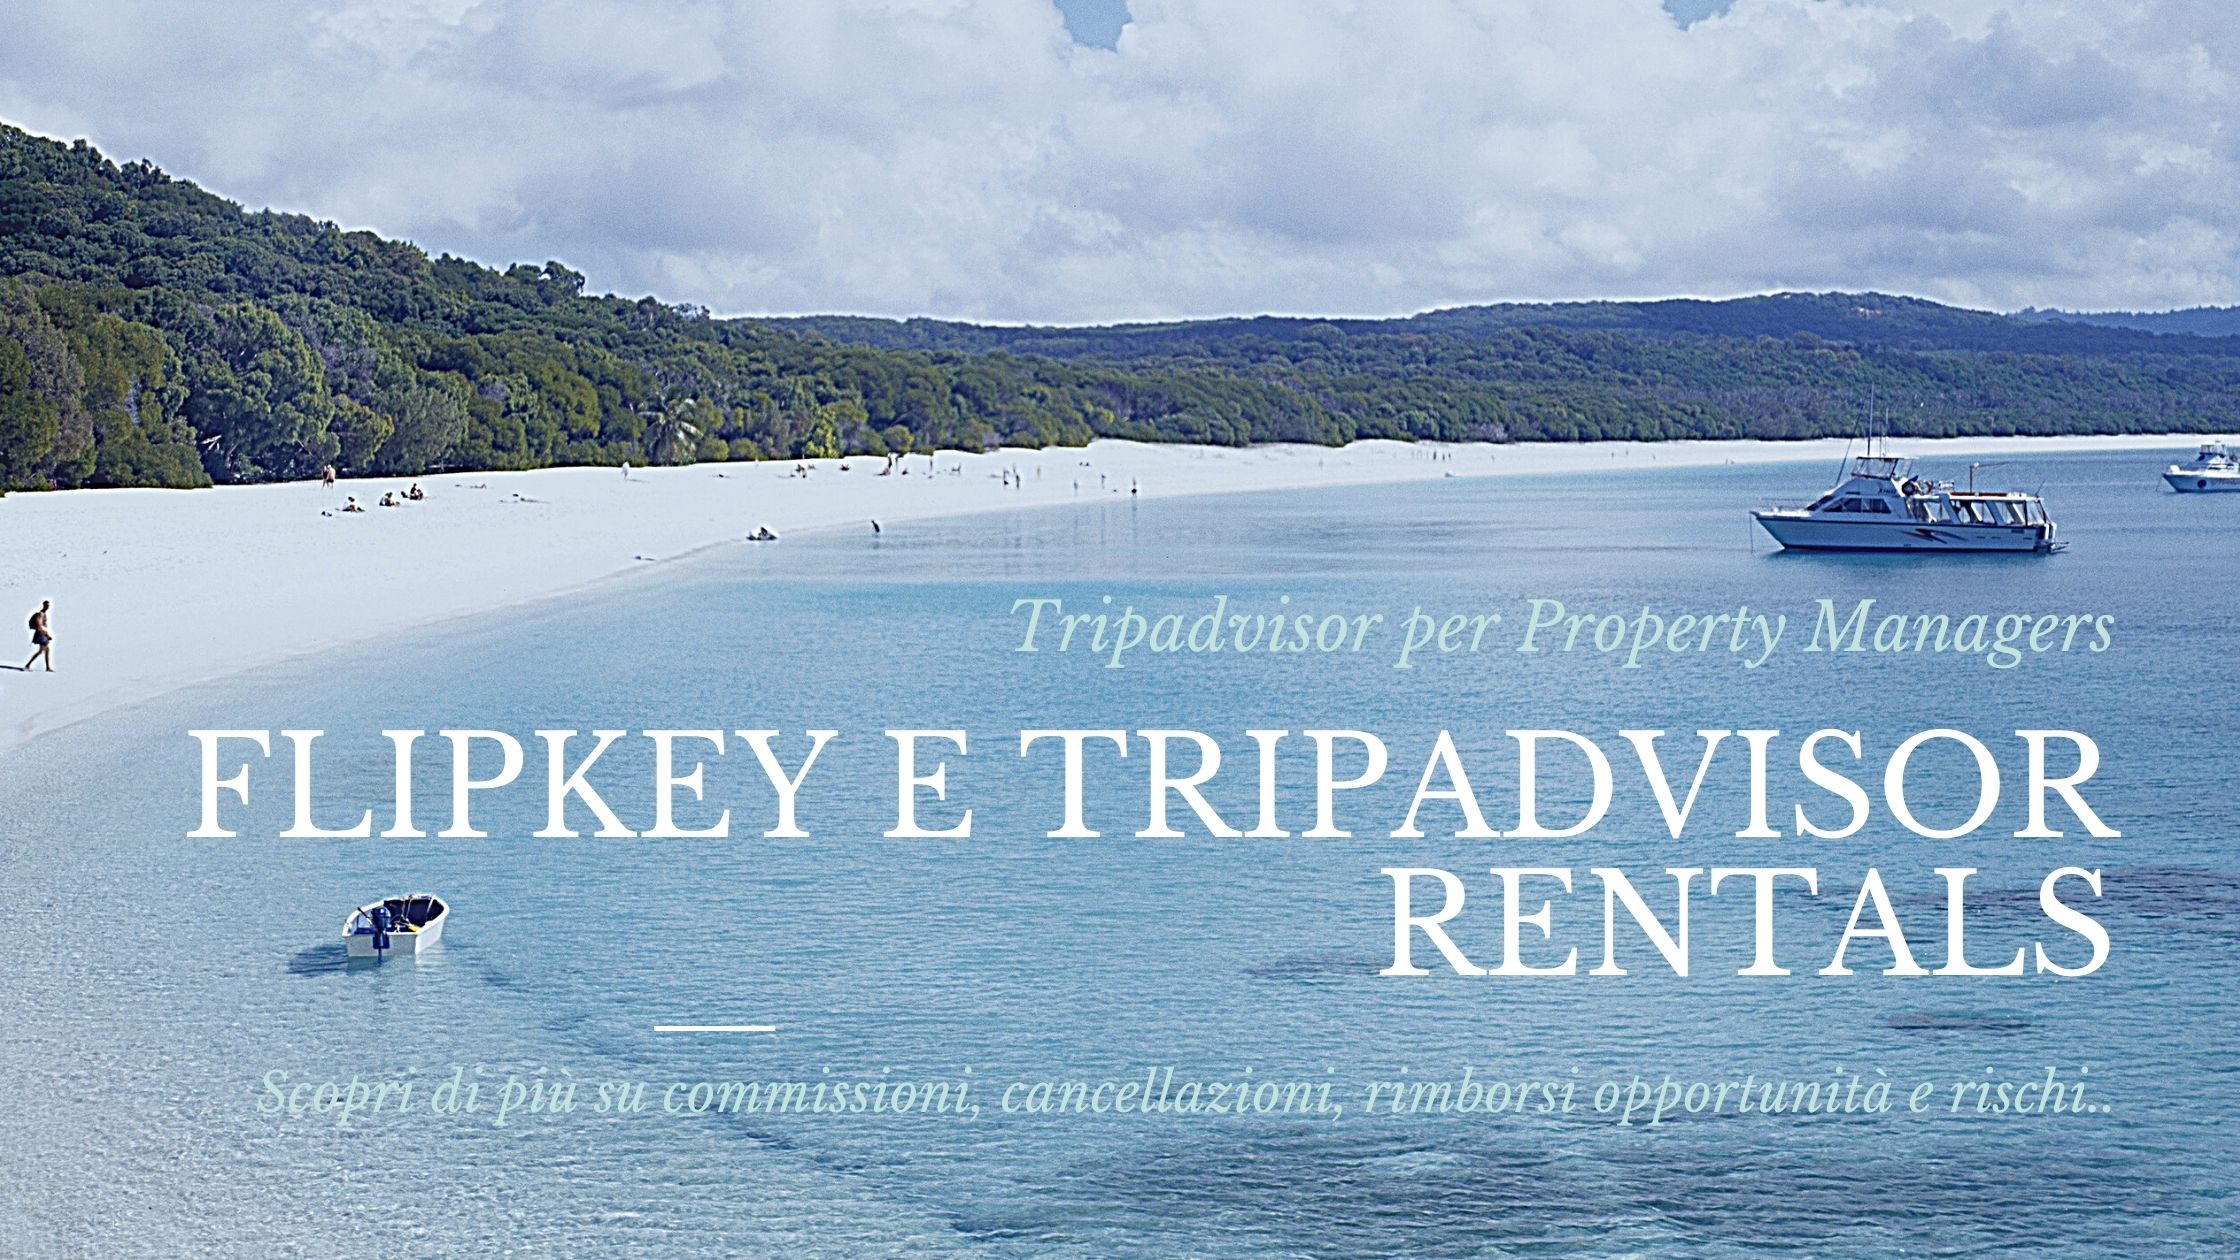 Tripadvisor per Property Managers